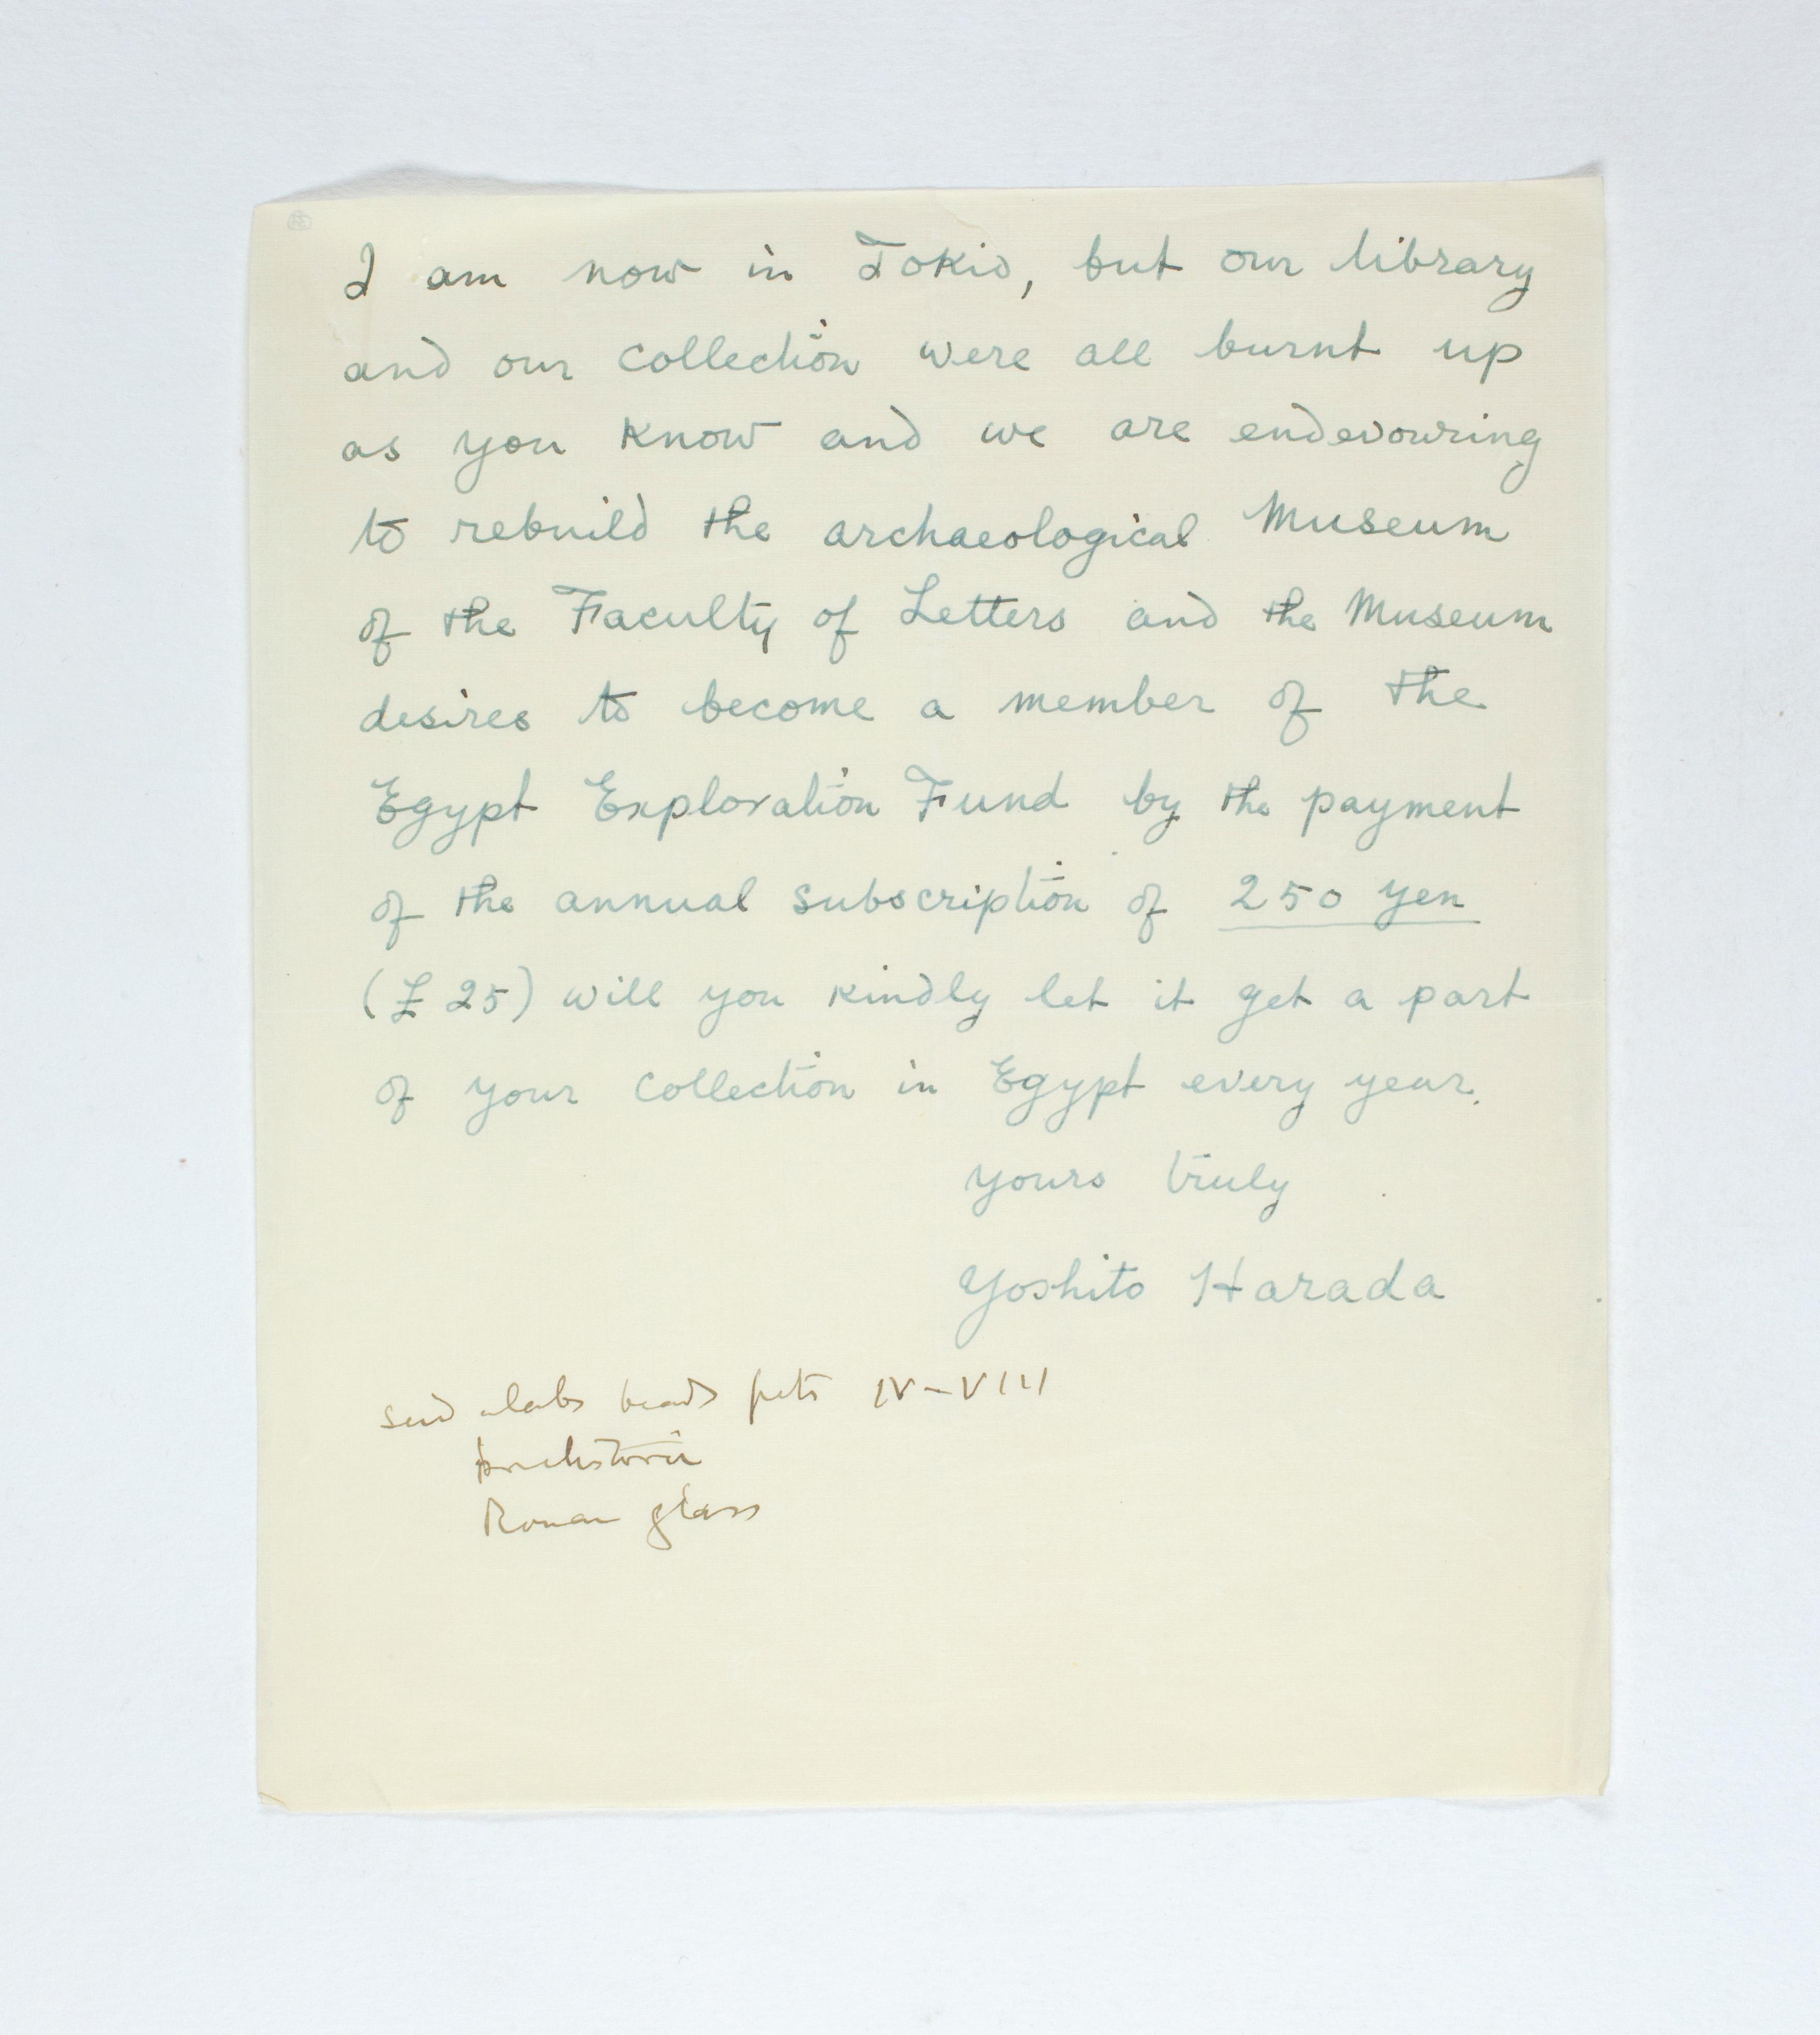 1923-24 Qau el-Kebir, Hemamieh Correspondence PMA/WFP1/D/27/37.2